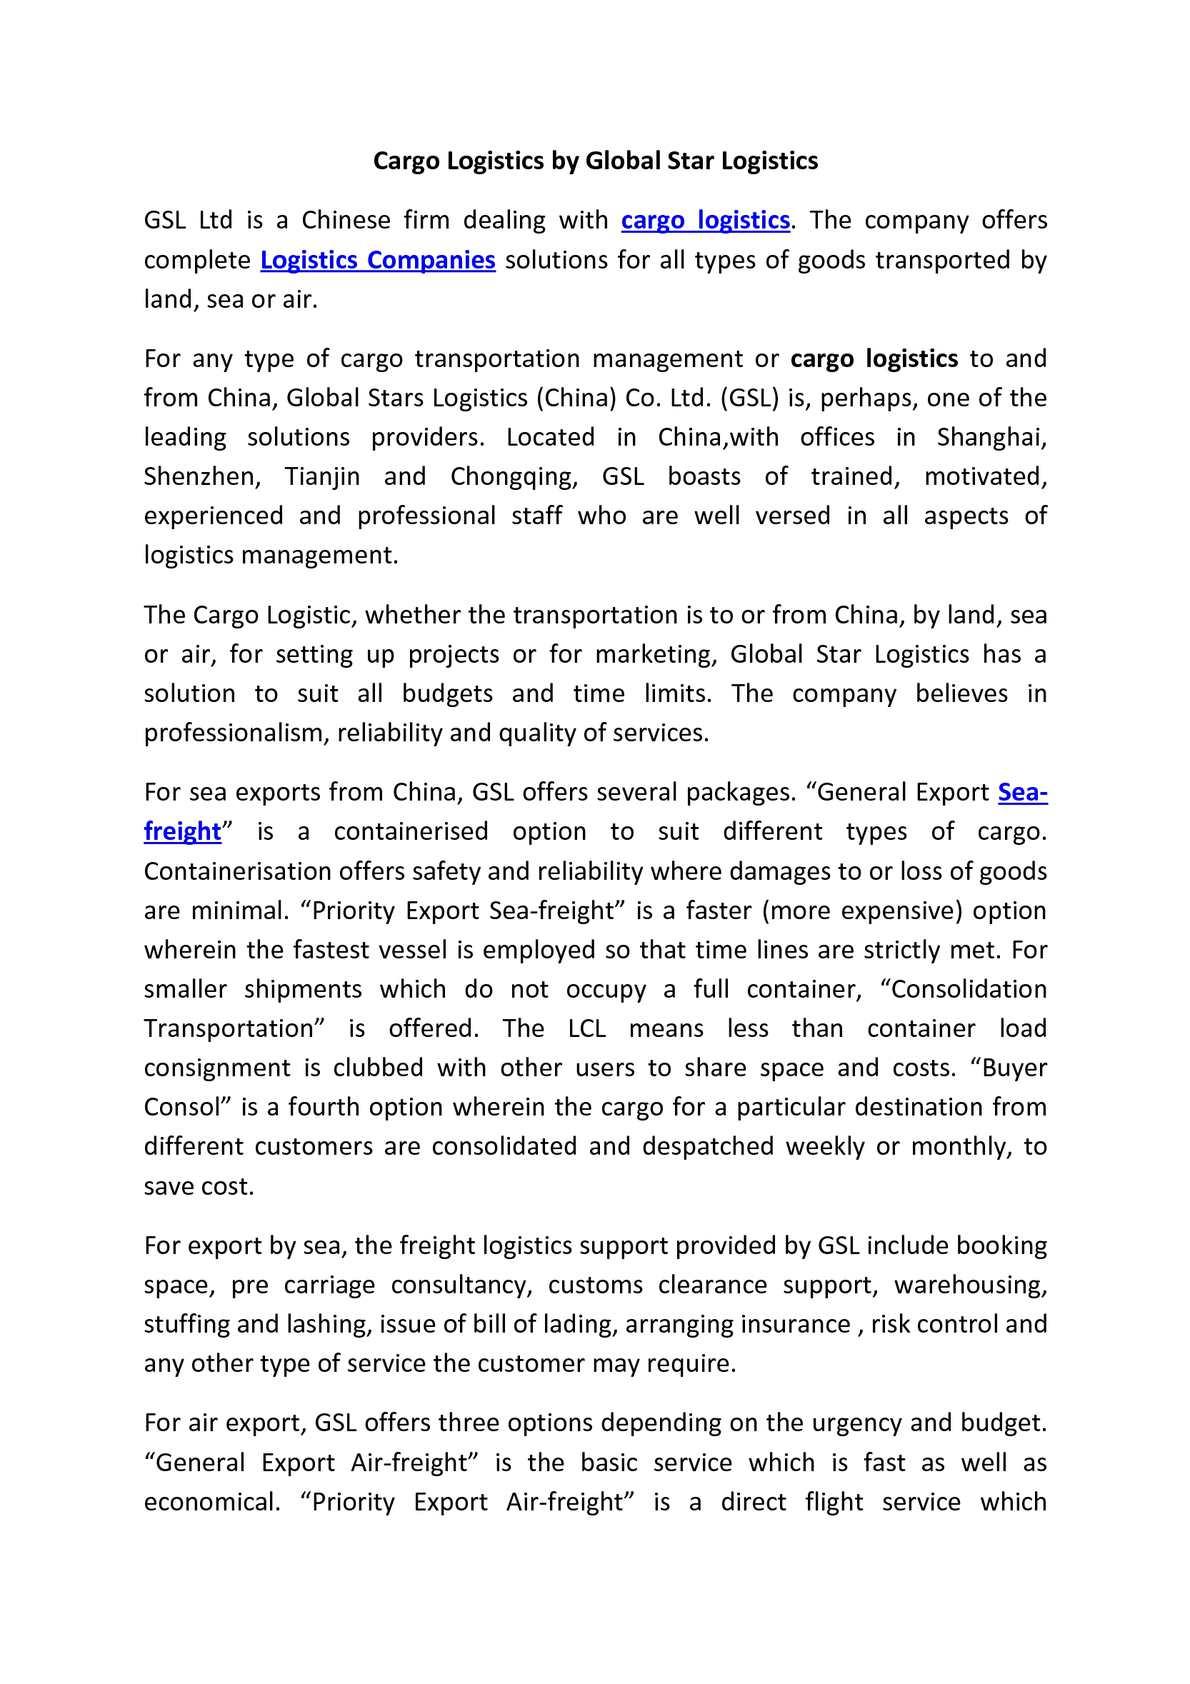 Calaméo - Cargo Logistics by Global Star Logistics